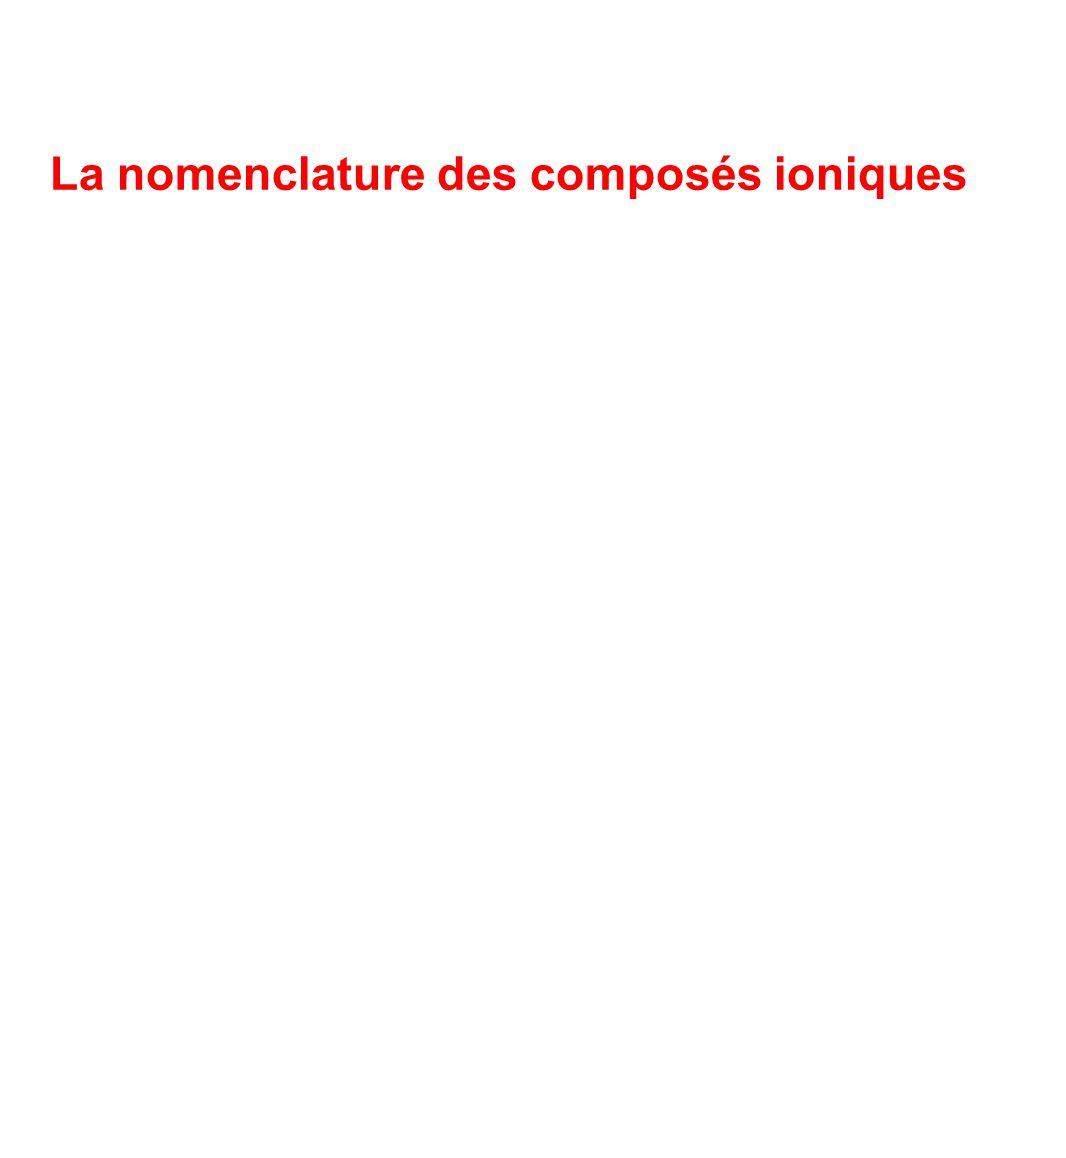 La nomenclature des composés ioniques